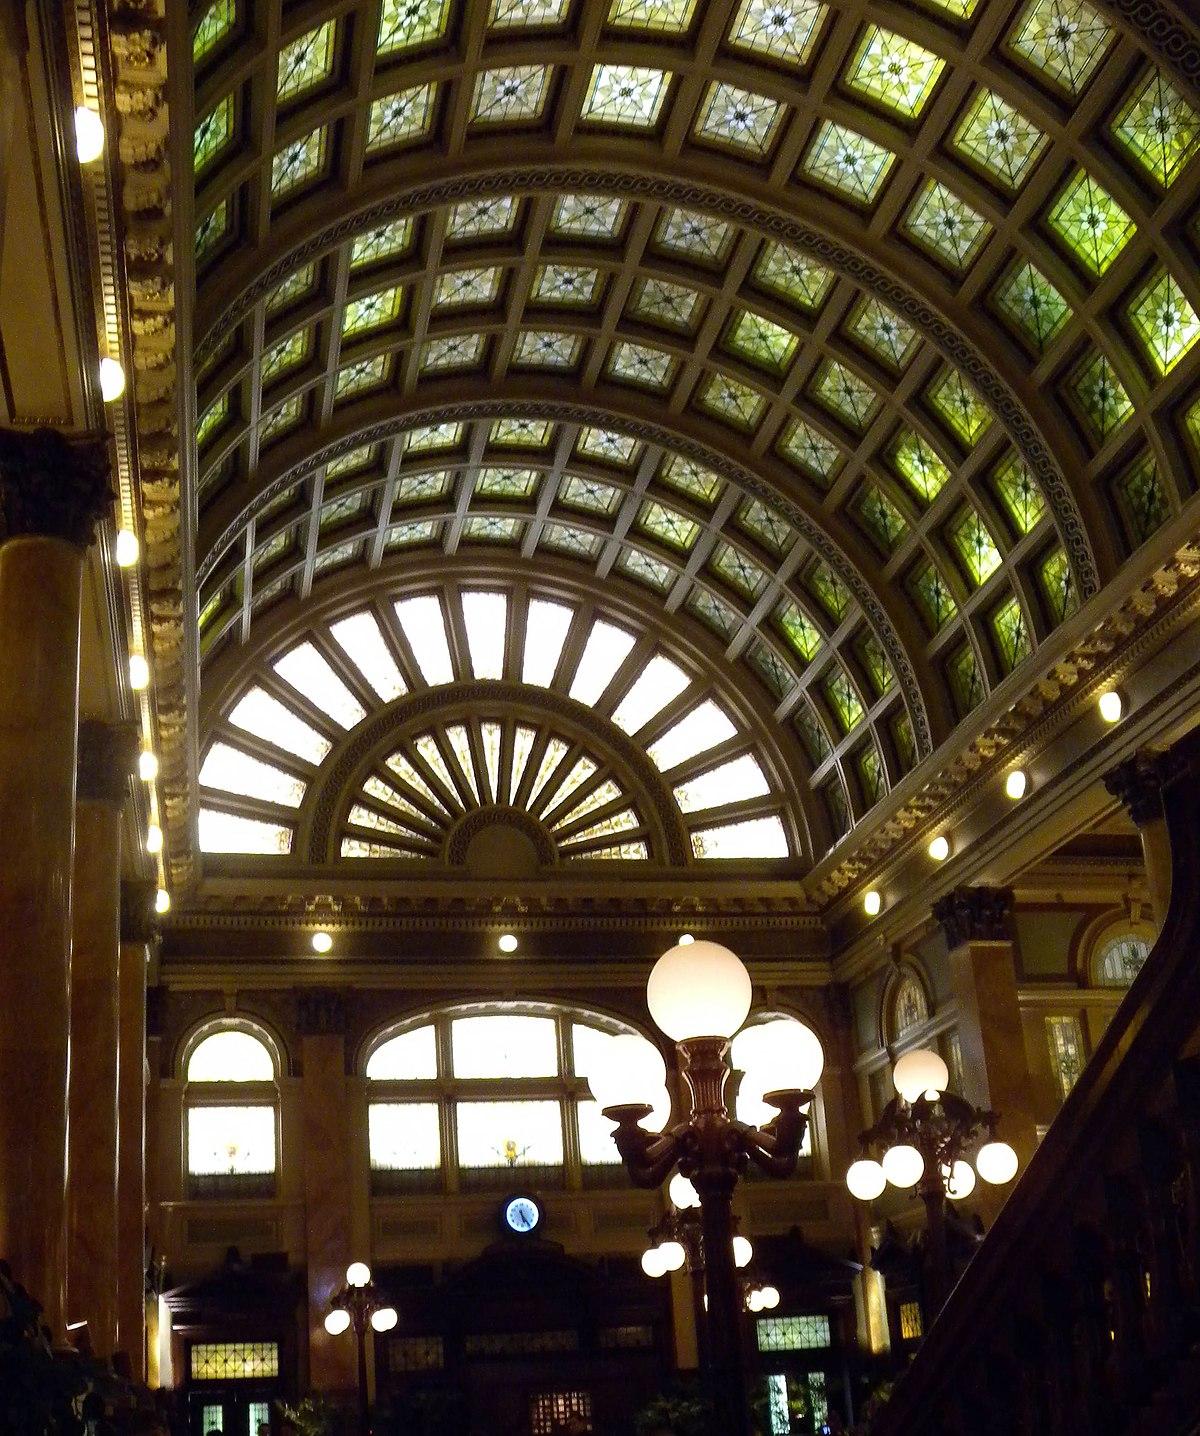 Pittsburgh & Lake Erie Railroad Station - Wikipedia